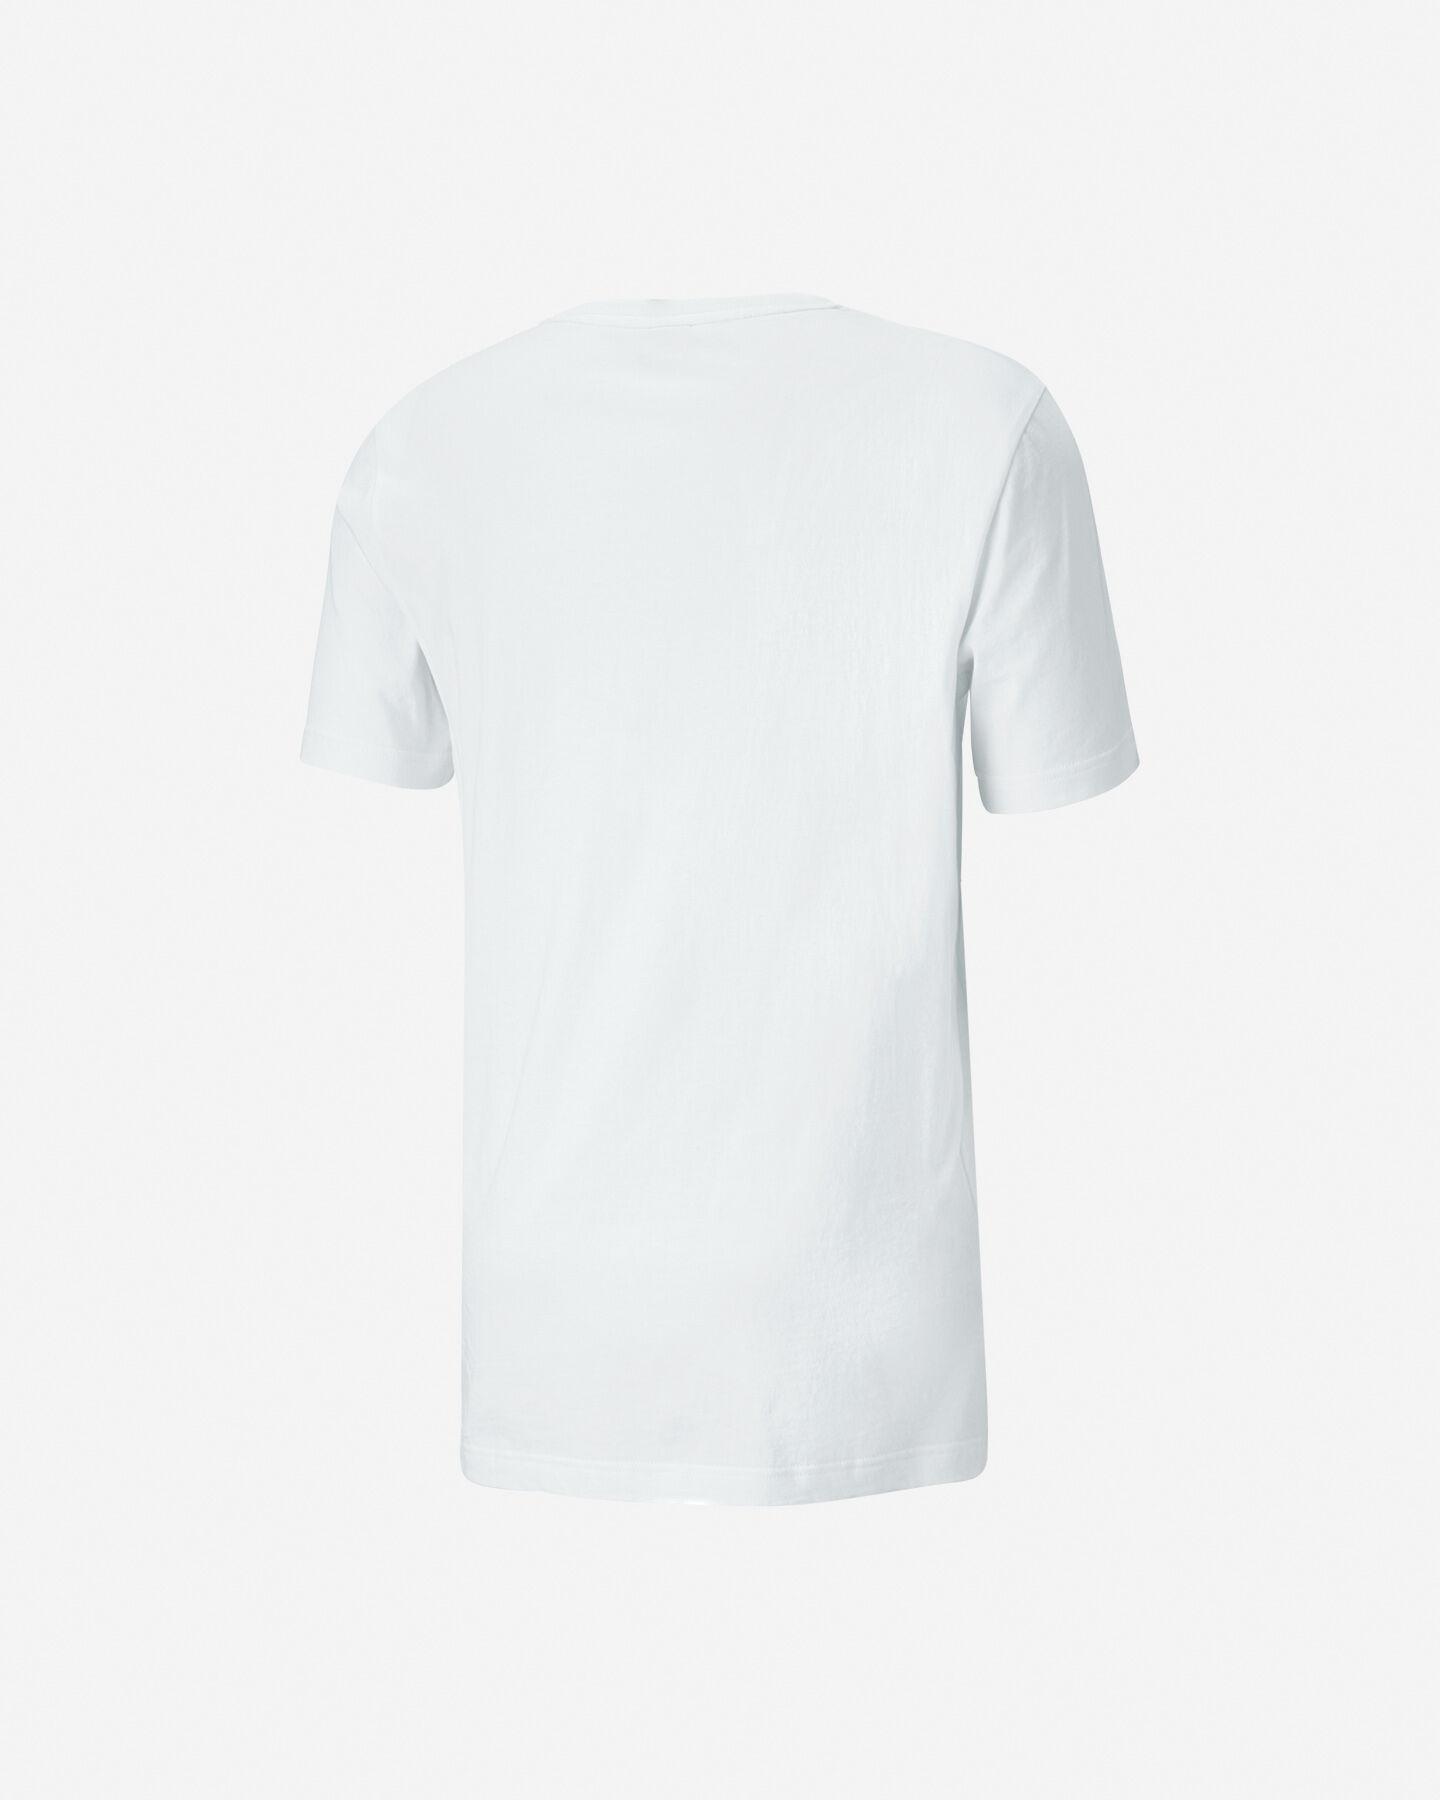 T-Shirt PUMA CLASSIC LOGO M S5235521 scatto 1